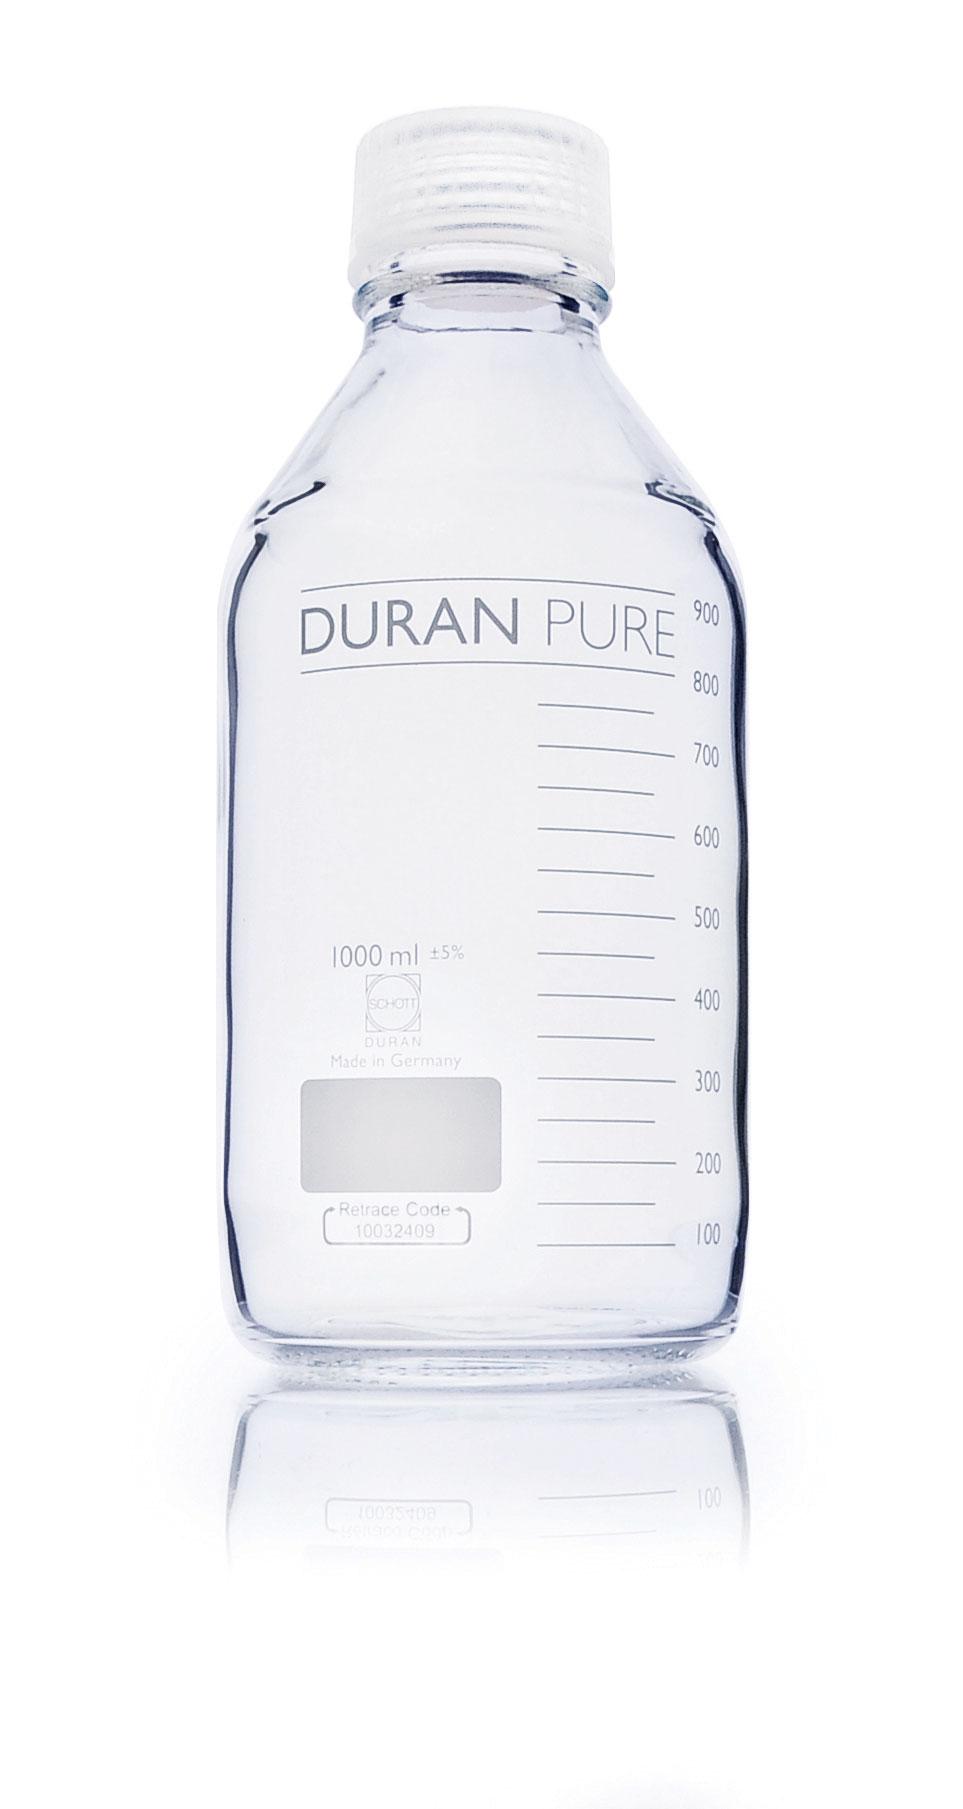 DURAN PURECap PFA , GL45 linerless [M114774] - $188 94 : The